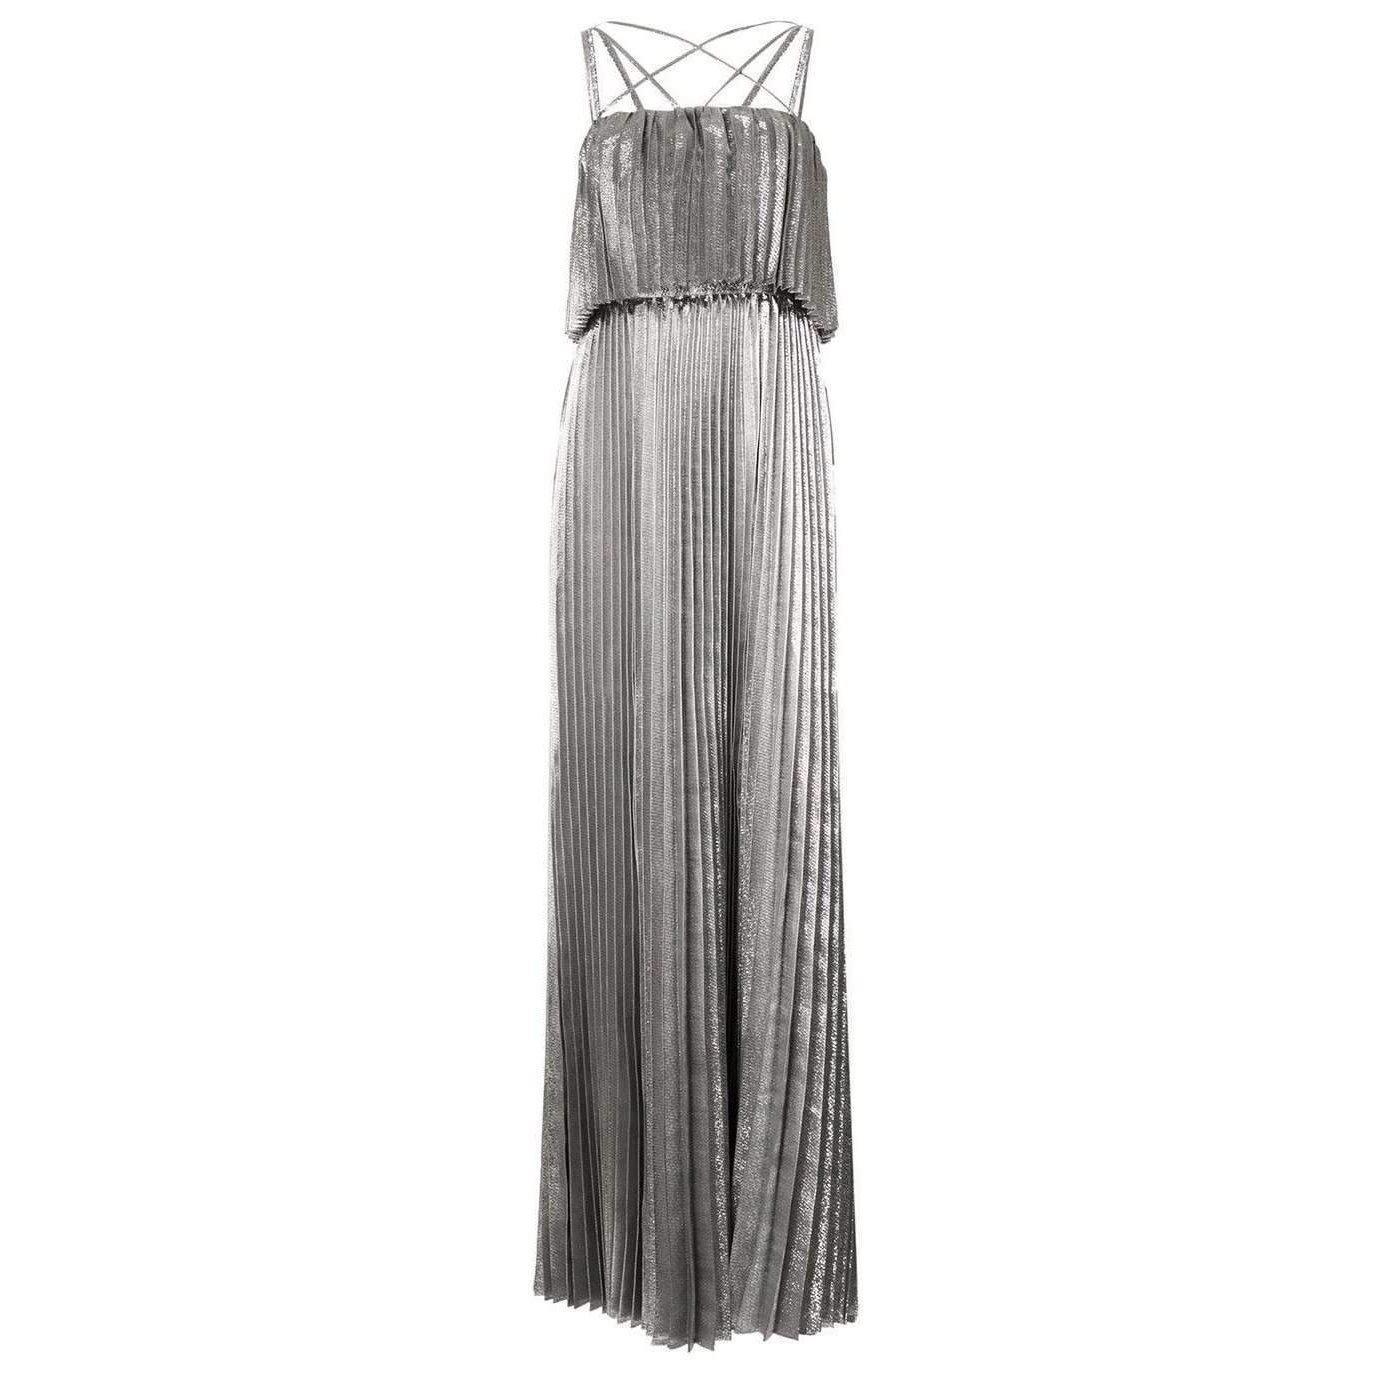 147788ef17b Zac Posen Ashley Spaghetti Tiered Silver Gown in Metallic - Save 73 ...